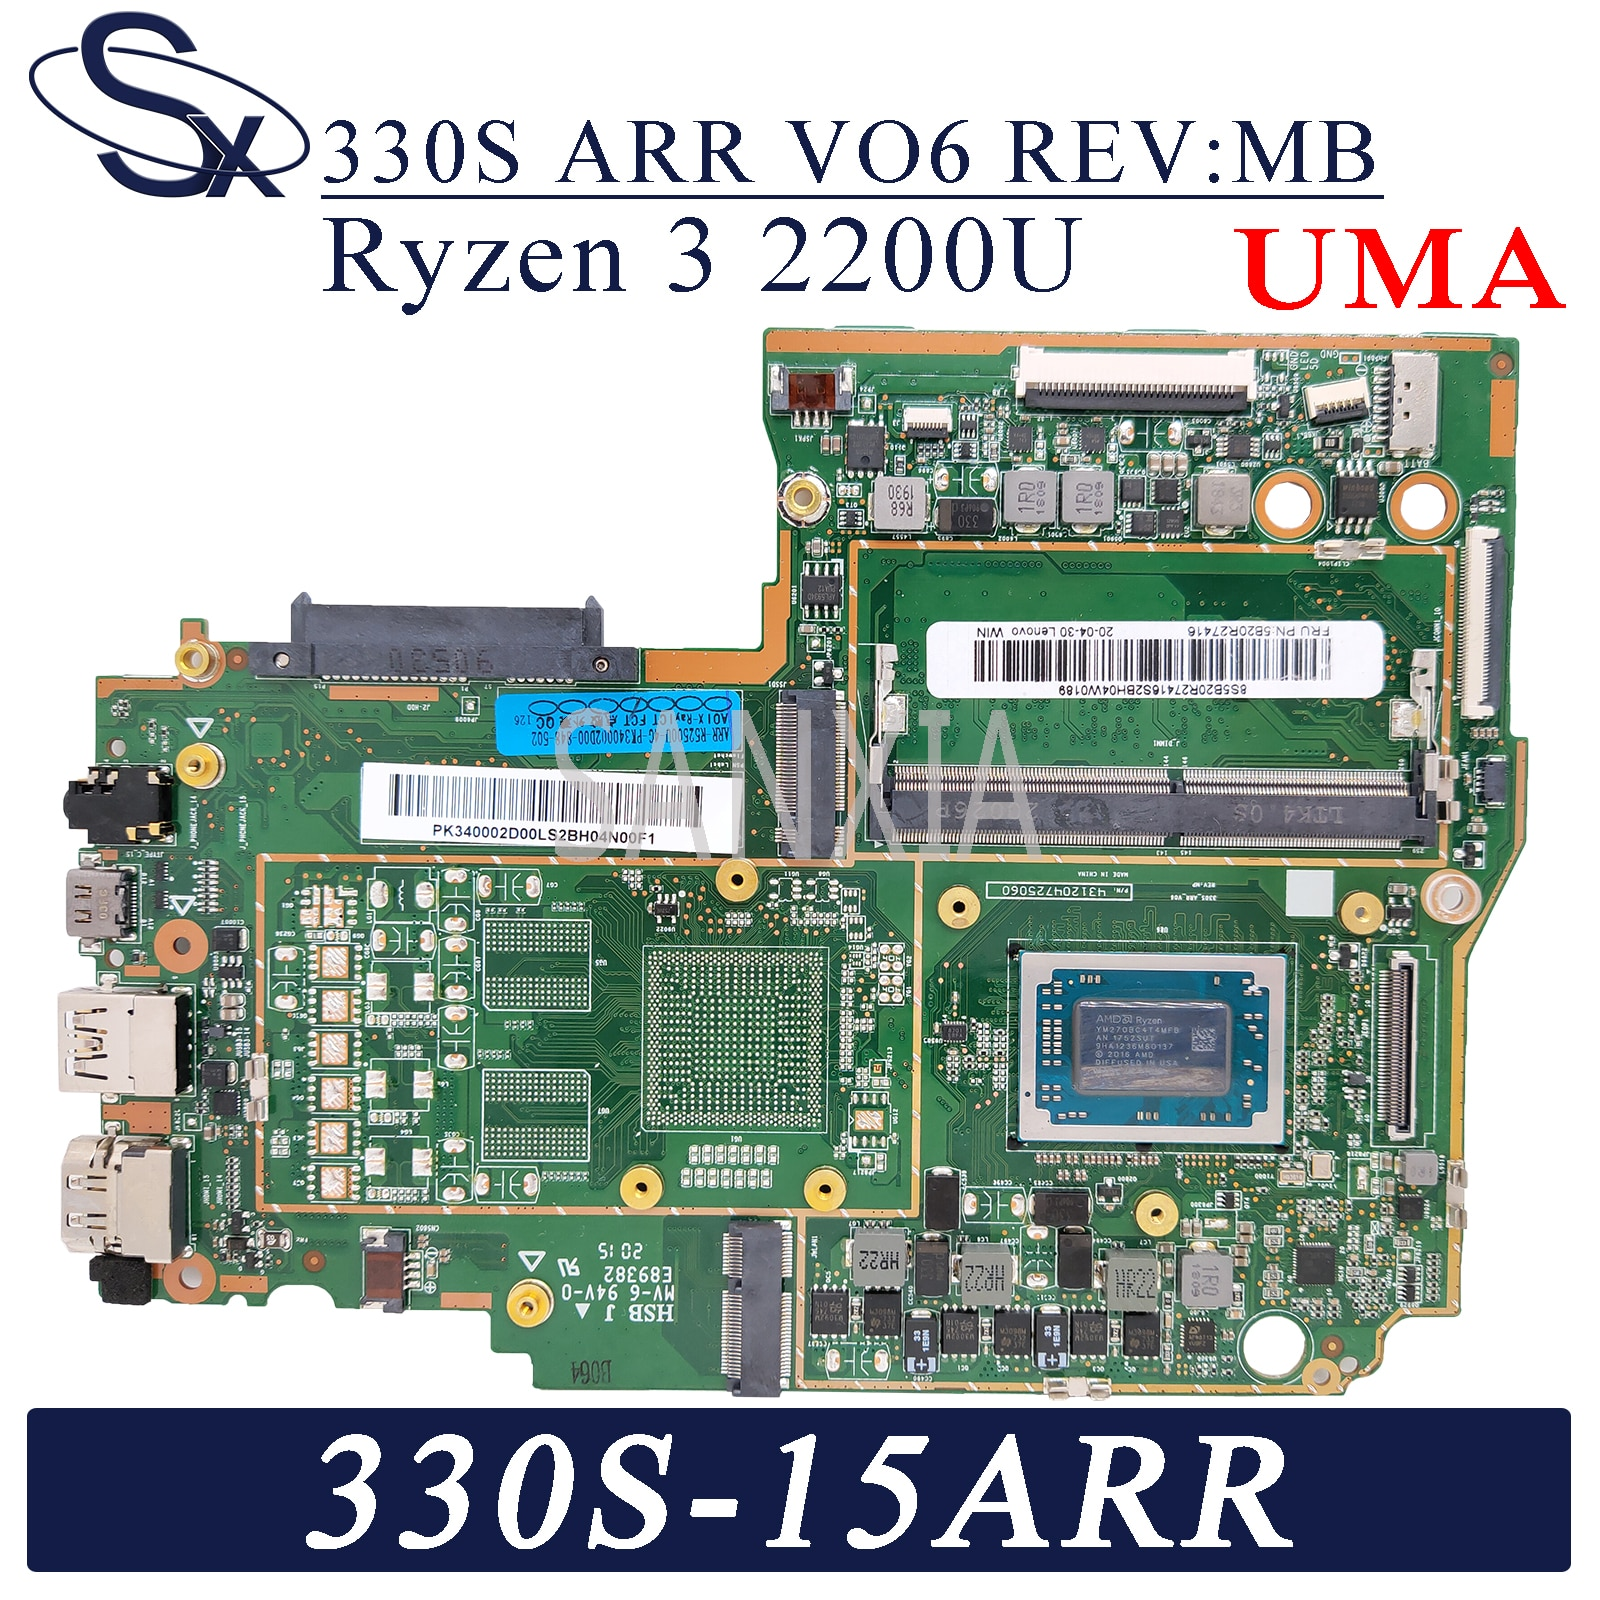 KEFU 330S_ARR_VO6 REV:MB اللوحة الأم لأجهزة الكمبيوتر المحمول لينوفو Ideapad 330S-15ARR 81FB اللوحة الرئيسية الأصلية Ryzen 3 2200U (R3-2200U) UMA